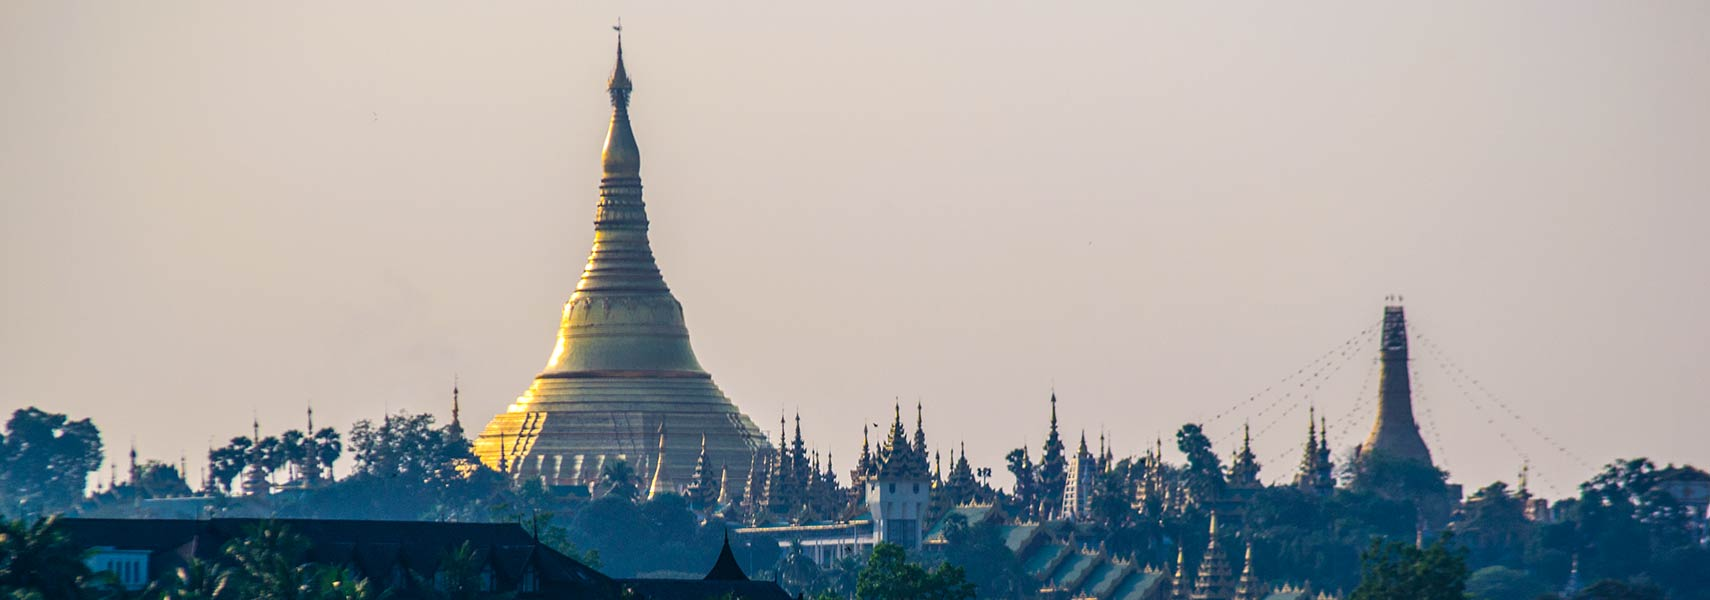 Shwedagon Pagoda at sunset, Yangon, Myanmar